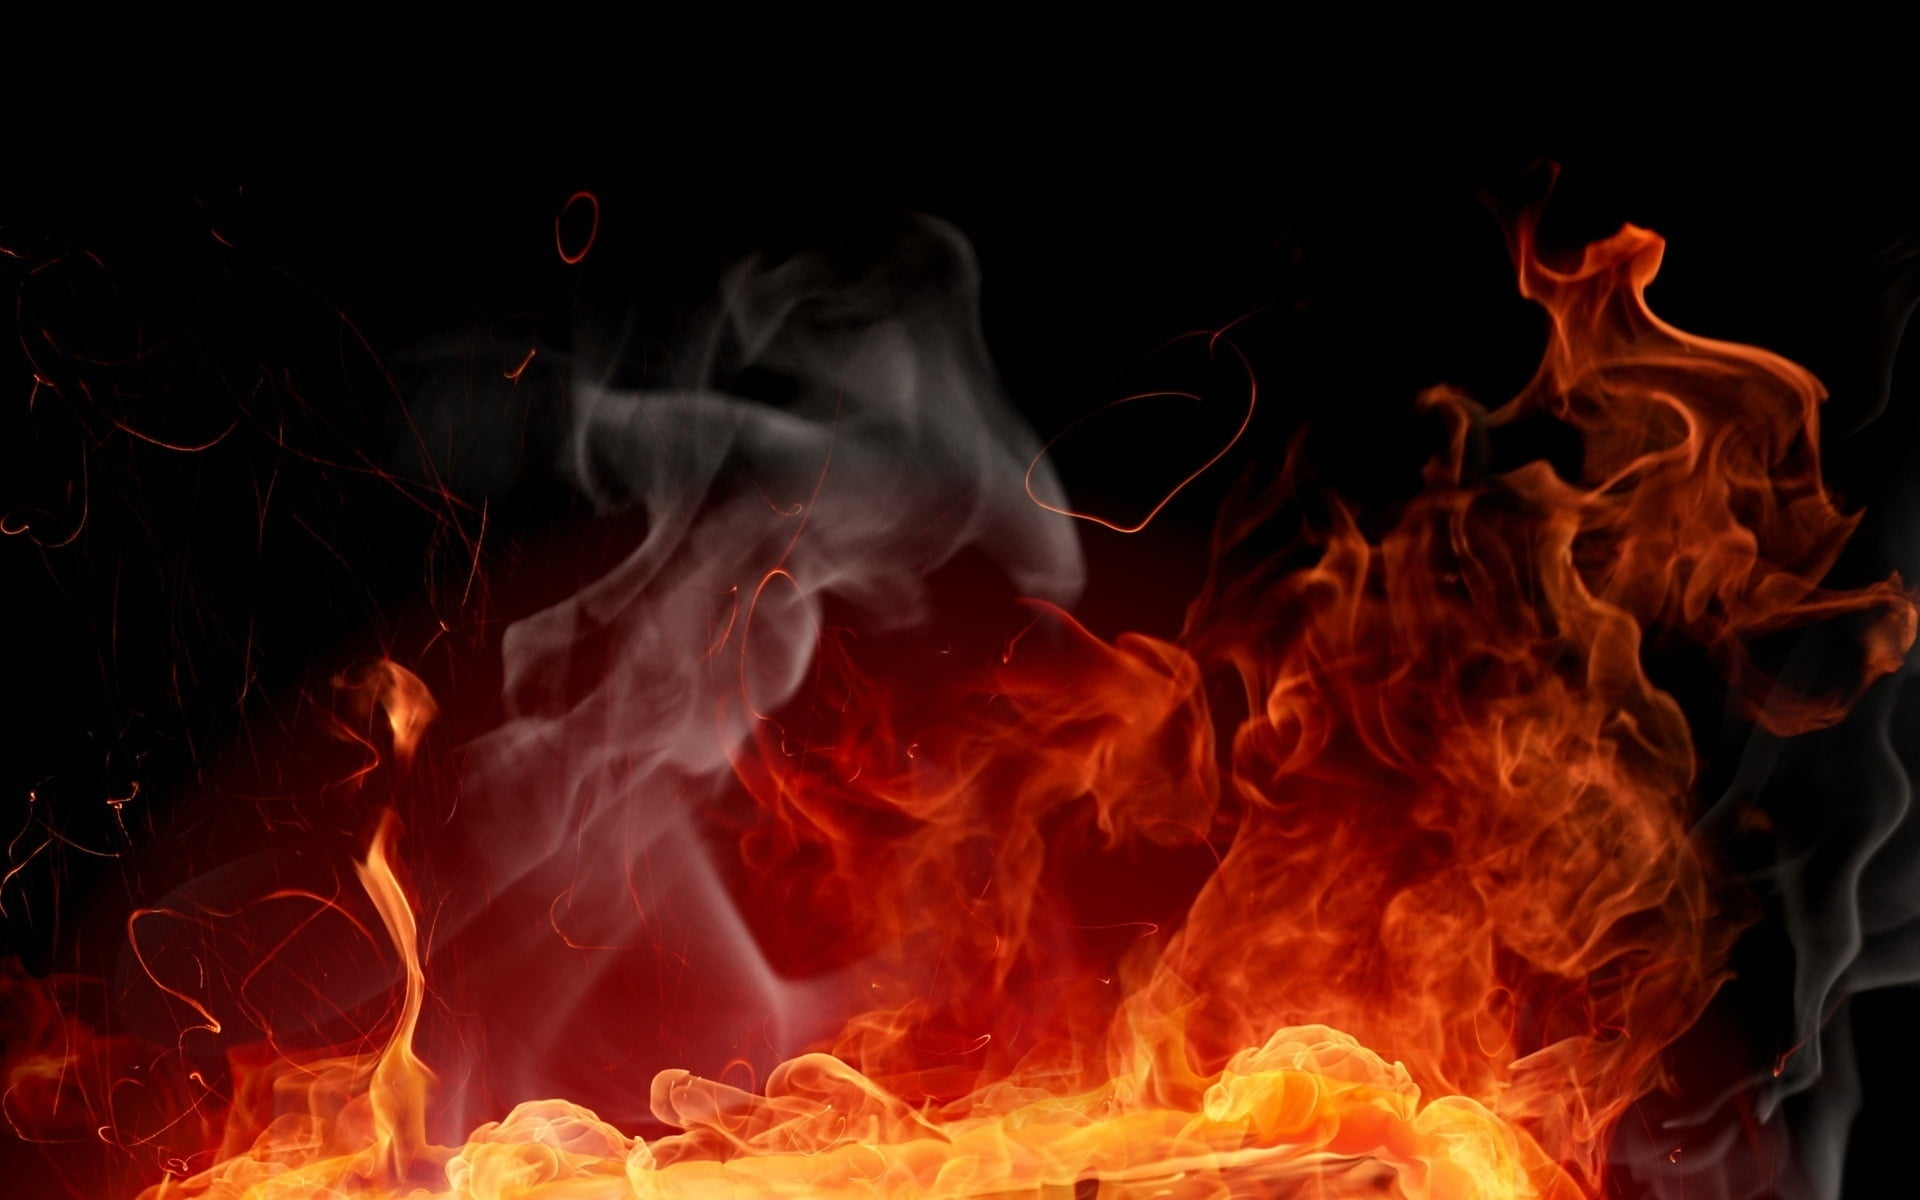 Fire Abstract Backgrounds 1600x1000 Download Hd Wallpaper Wallpapertip